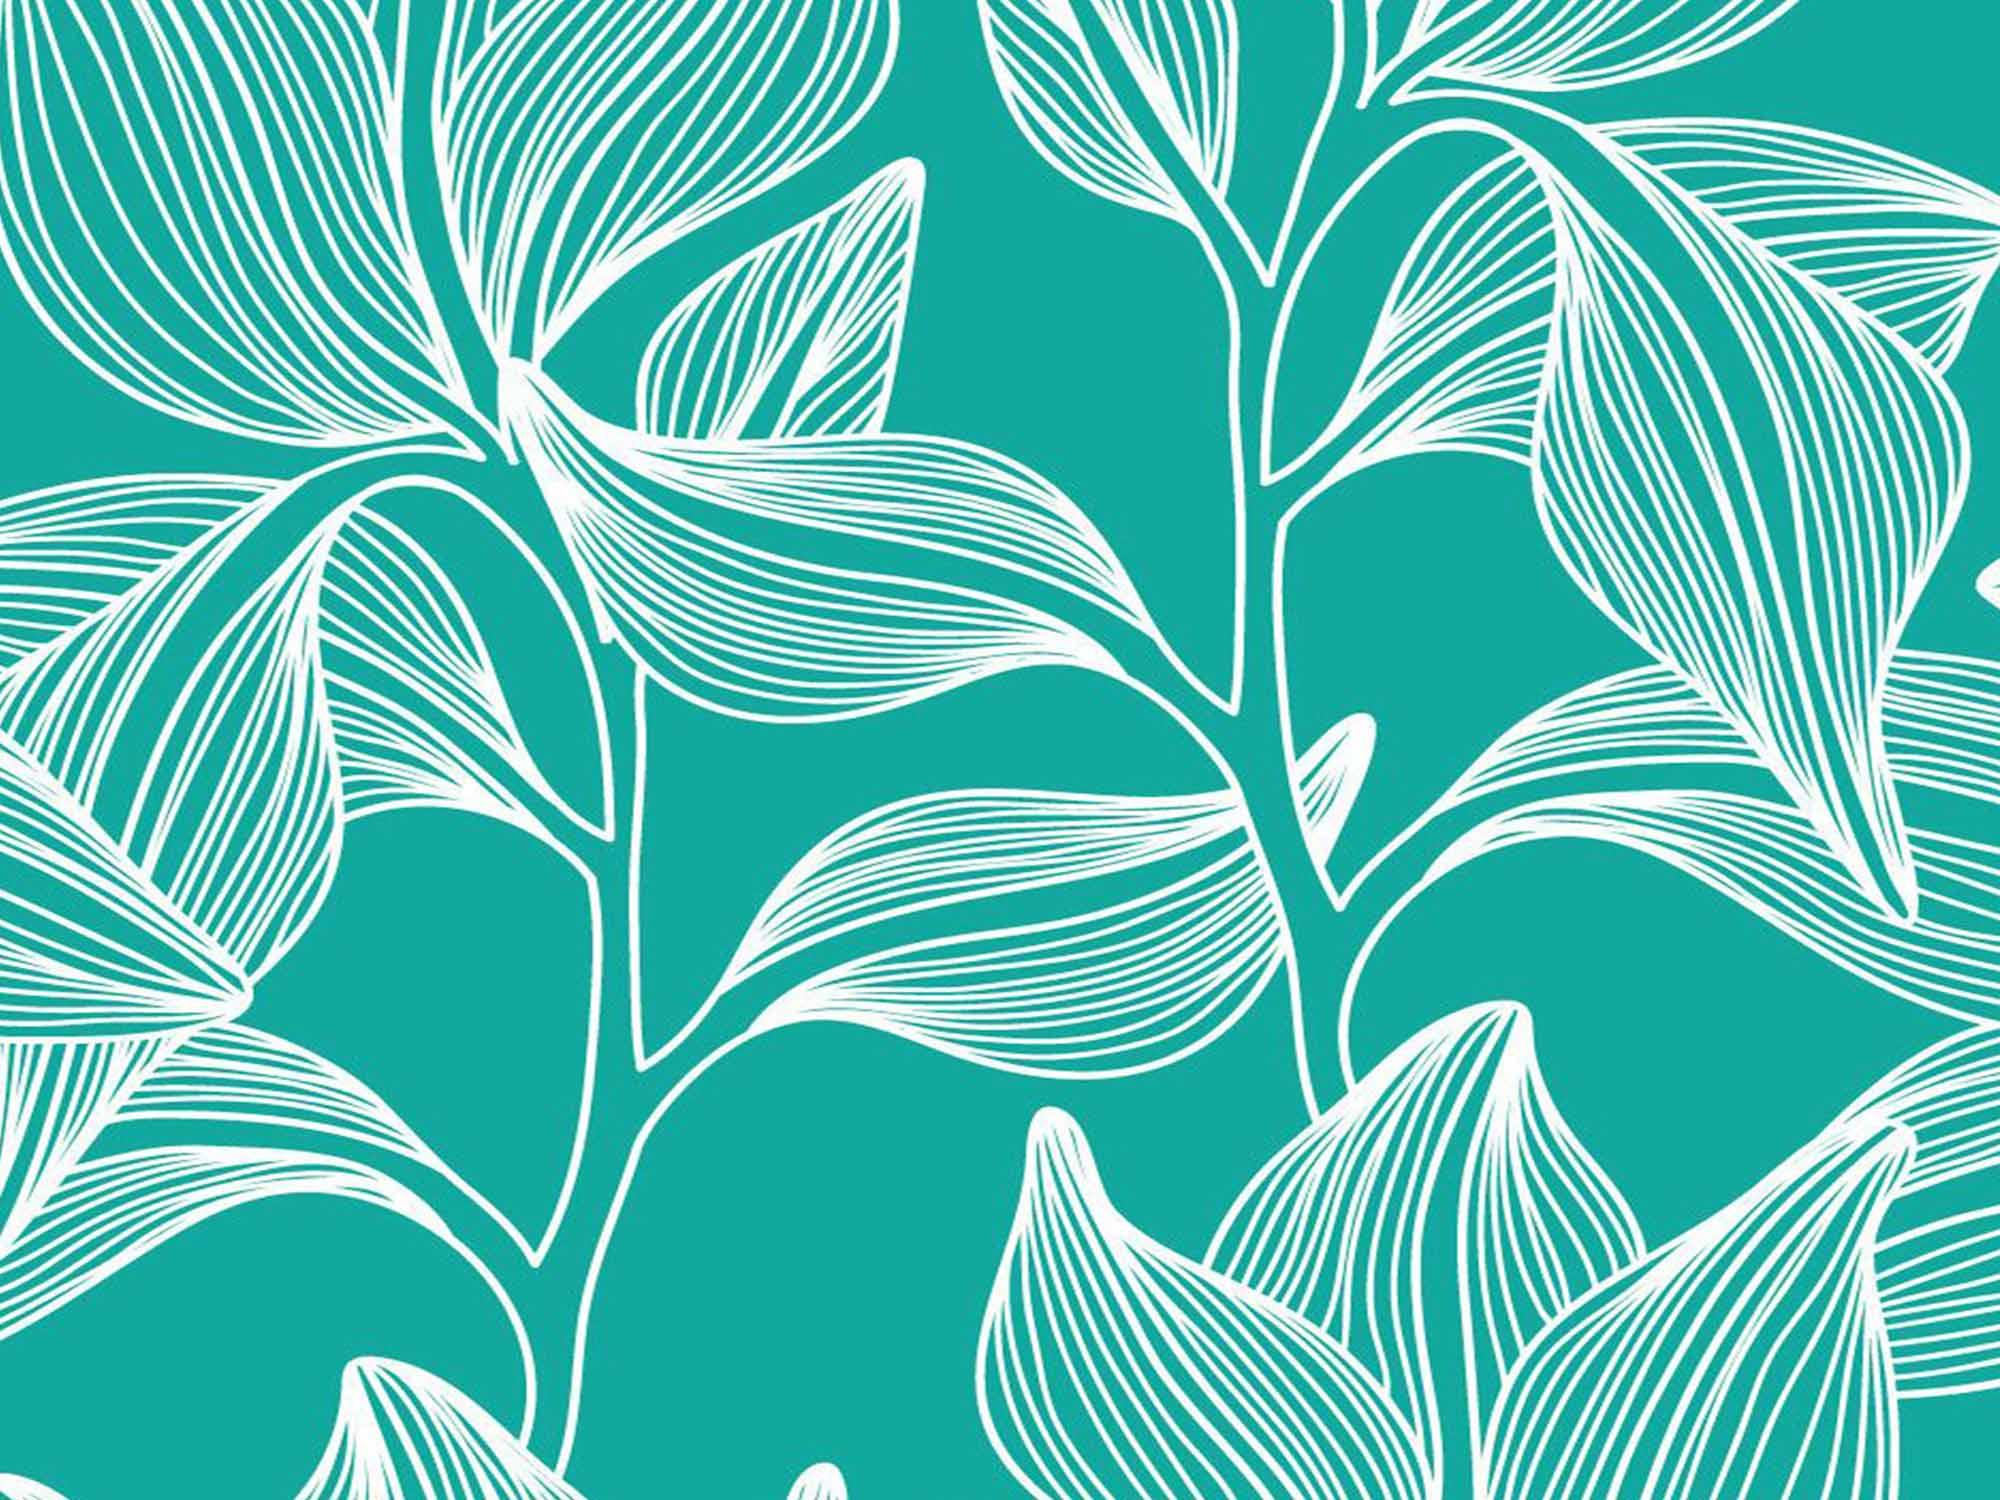 Papel de Parede Floral 0098 - Adesivos de Parede  - Paredes Decoradas